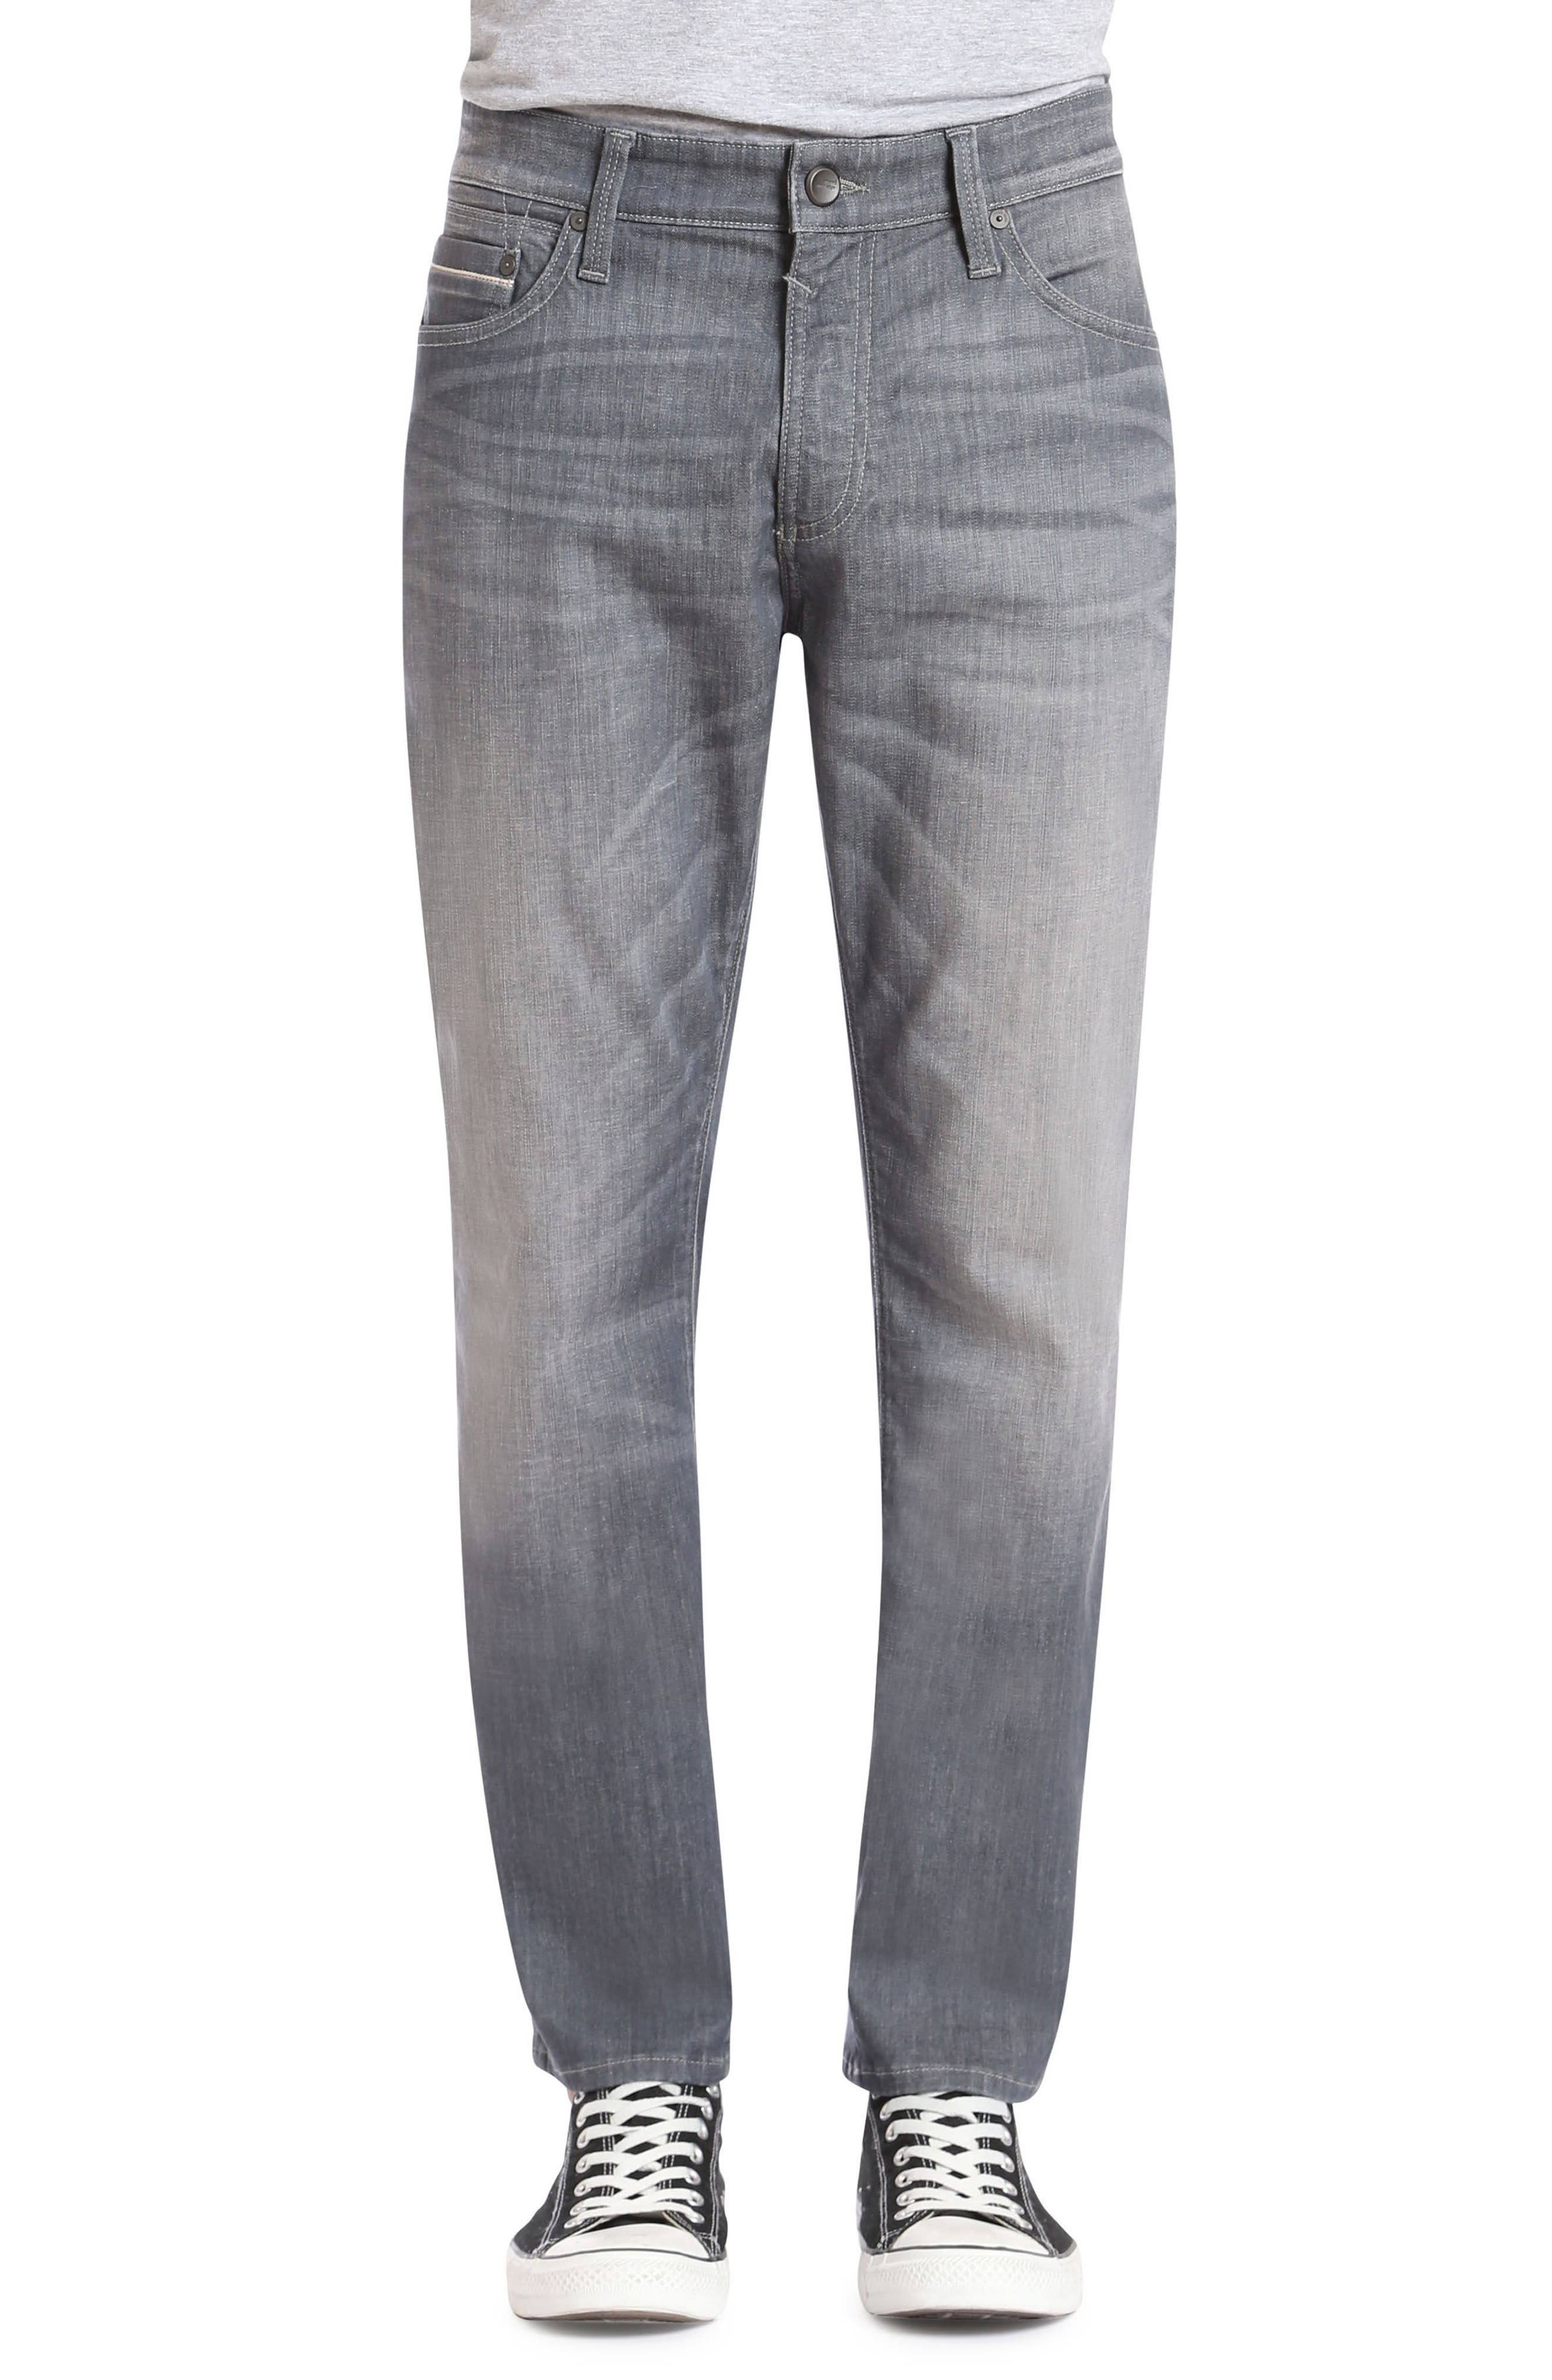 Marcus Slim Straight Leg Jeans,                         Main,                         color, 020